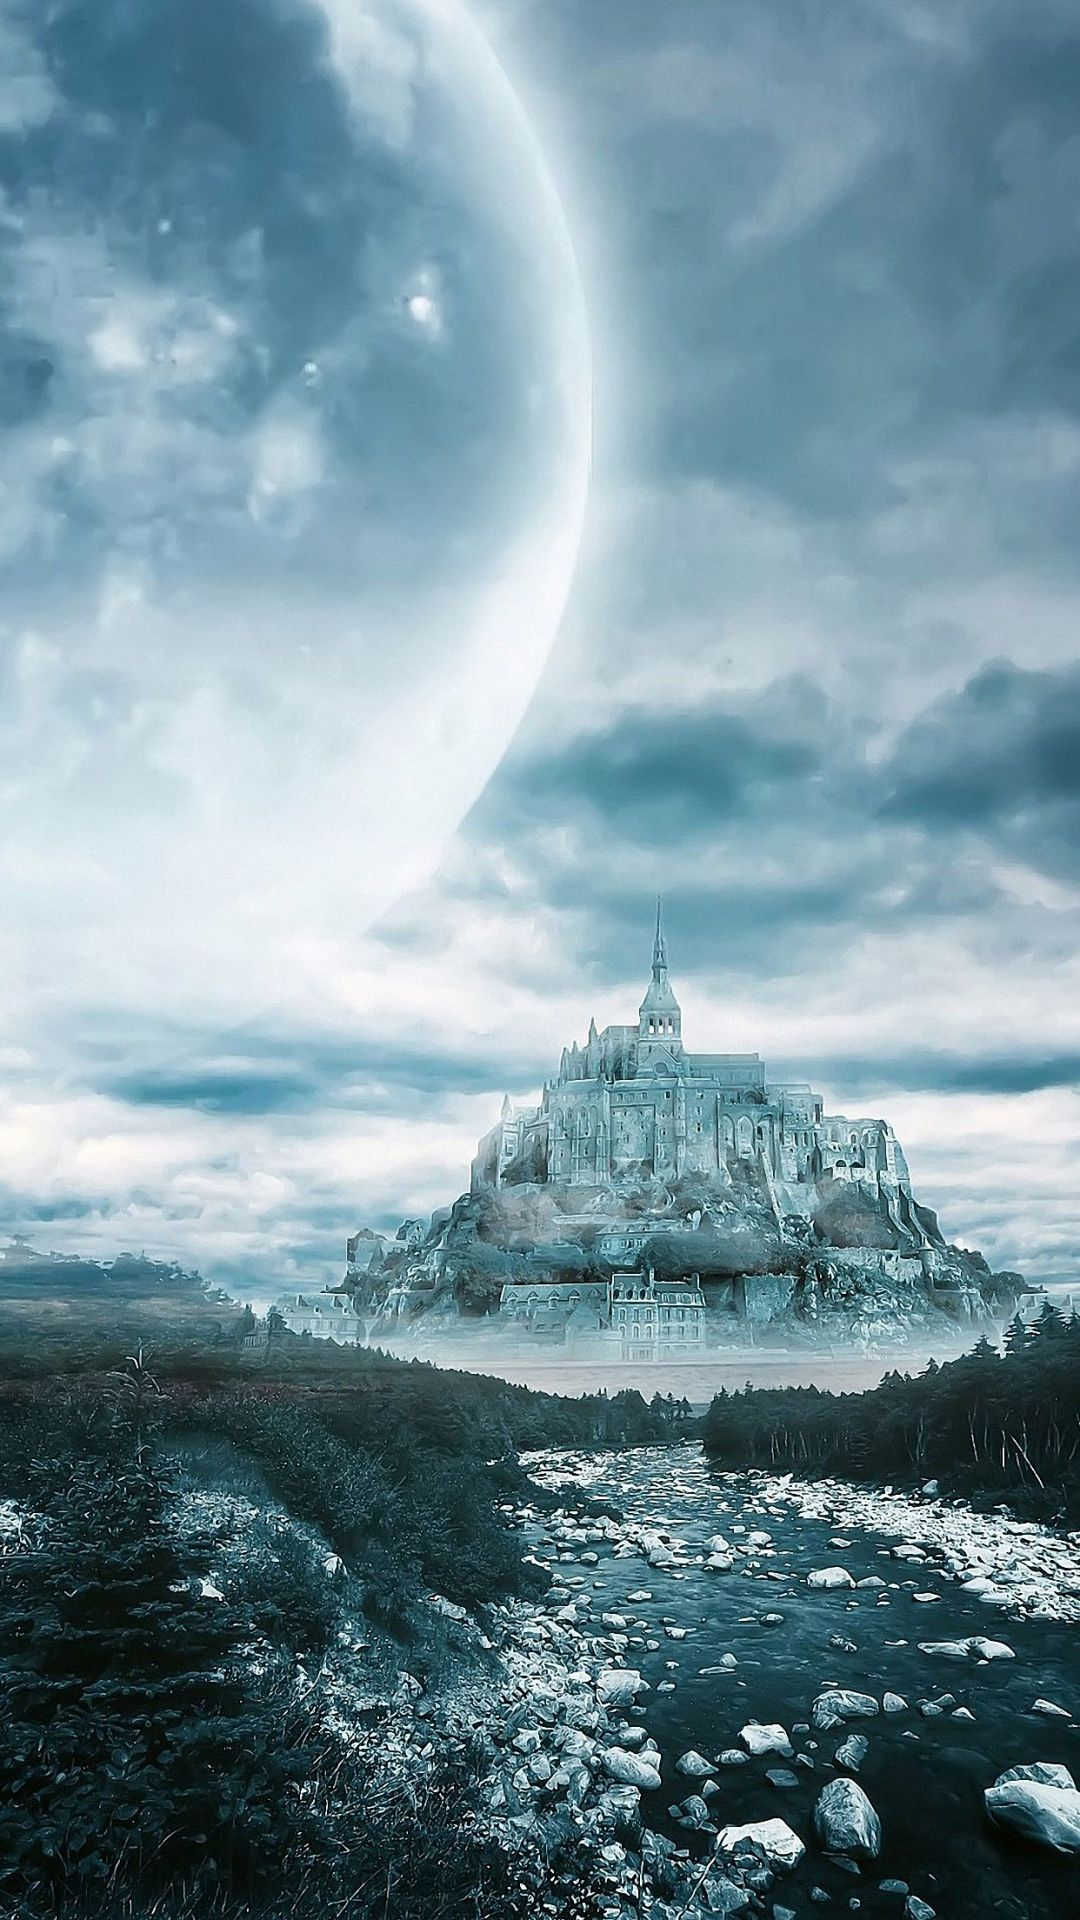 Hd Dream Moon Castle Wallpaper For Iphone S S Plus